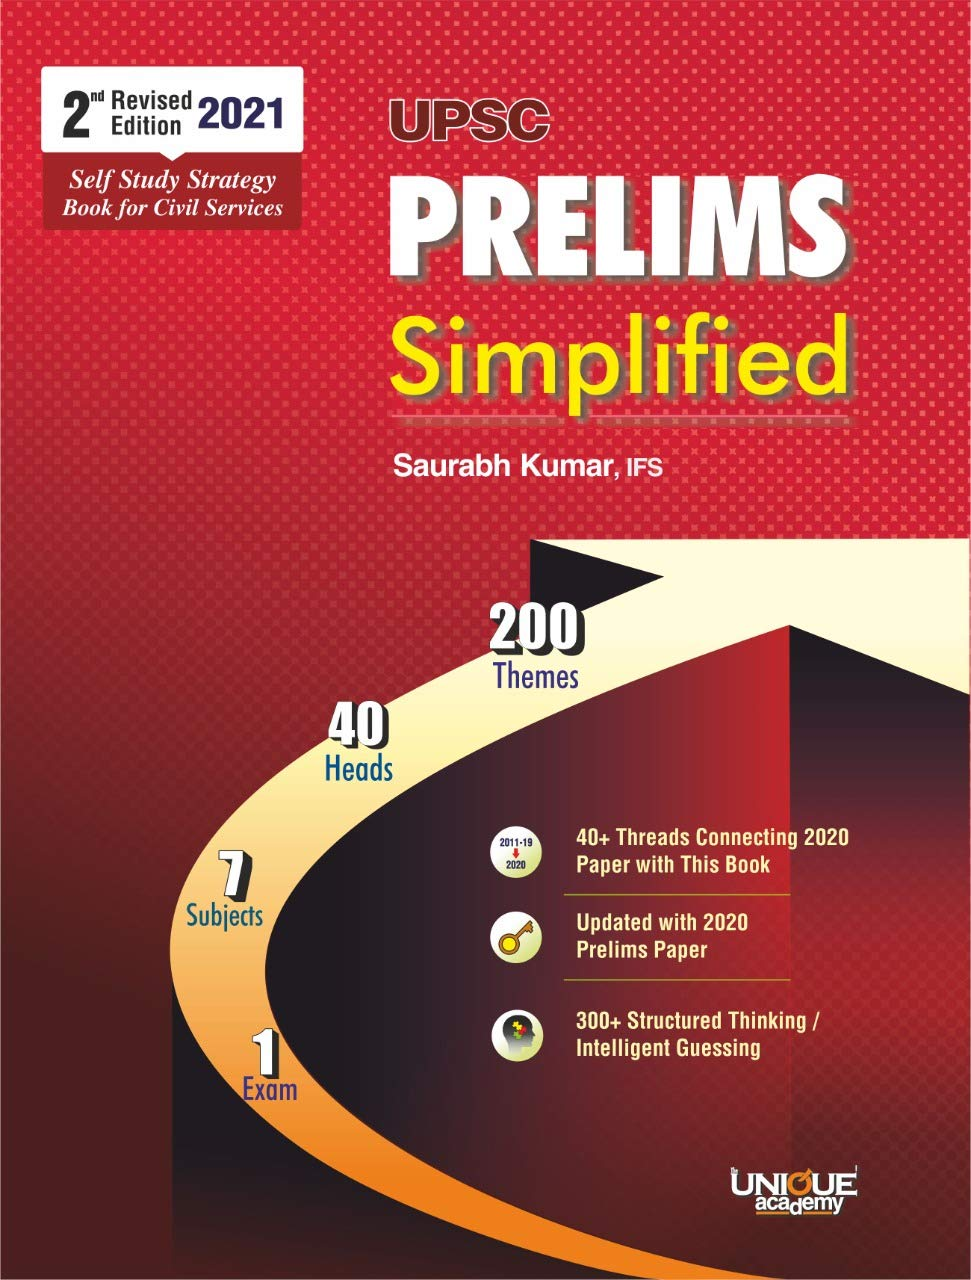 Unique UPSC PRELIMS Simplified 2nd edition : Self Study Strategy book for Civil Services Prelims